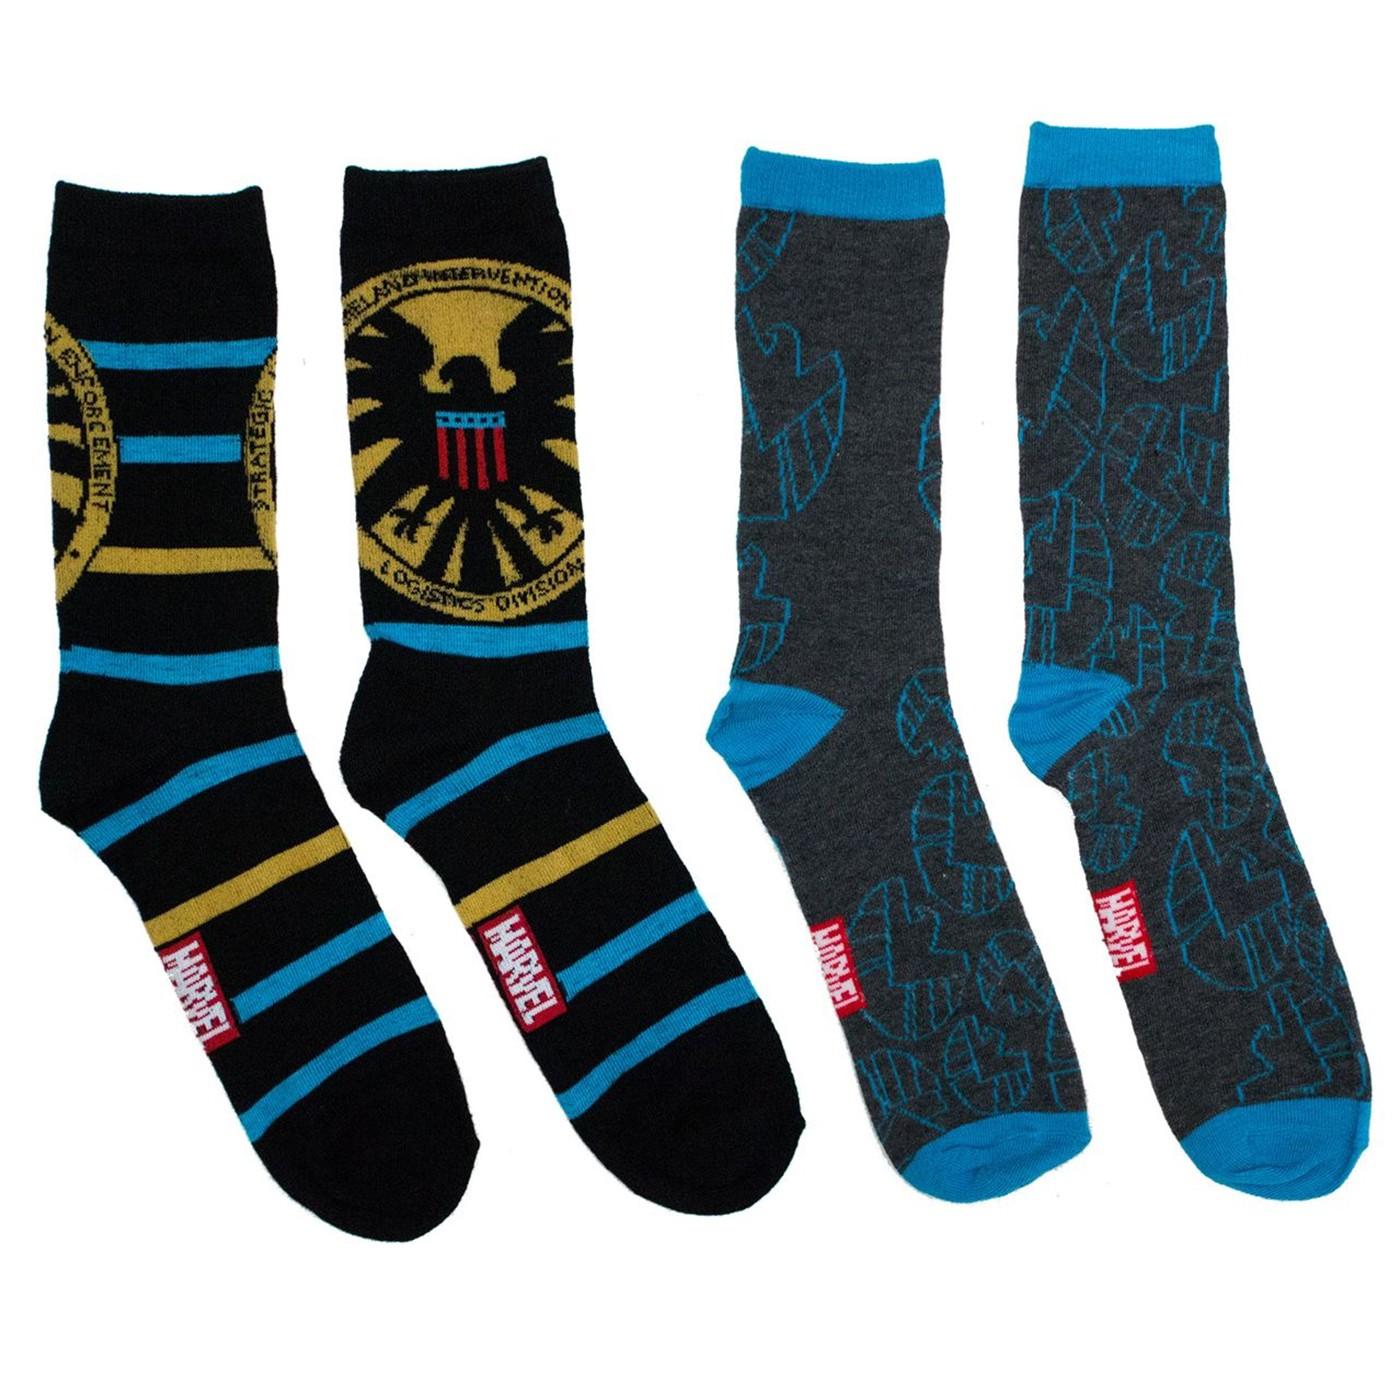 SHIELD 2-pack Crew Socks